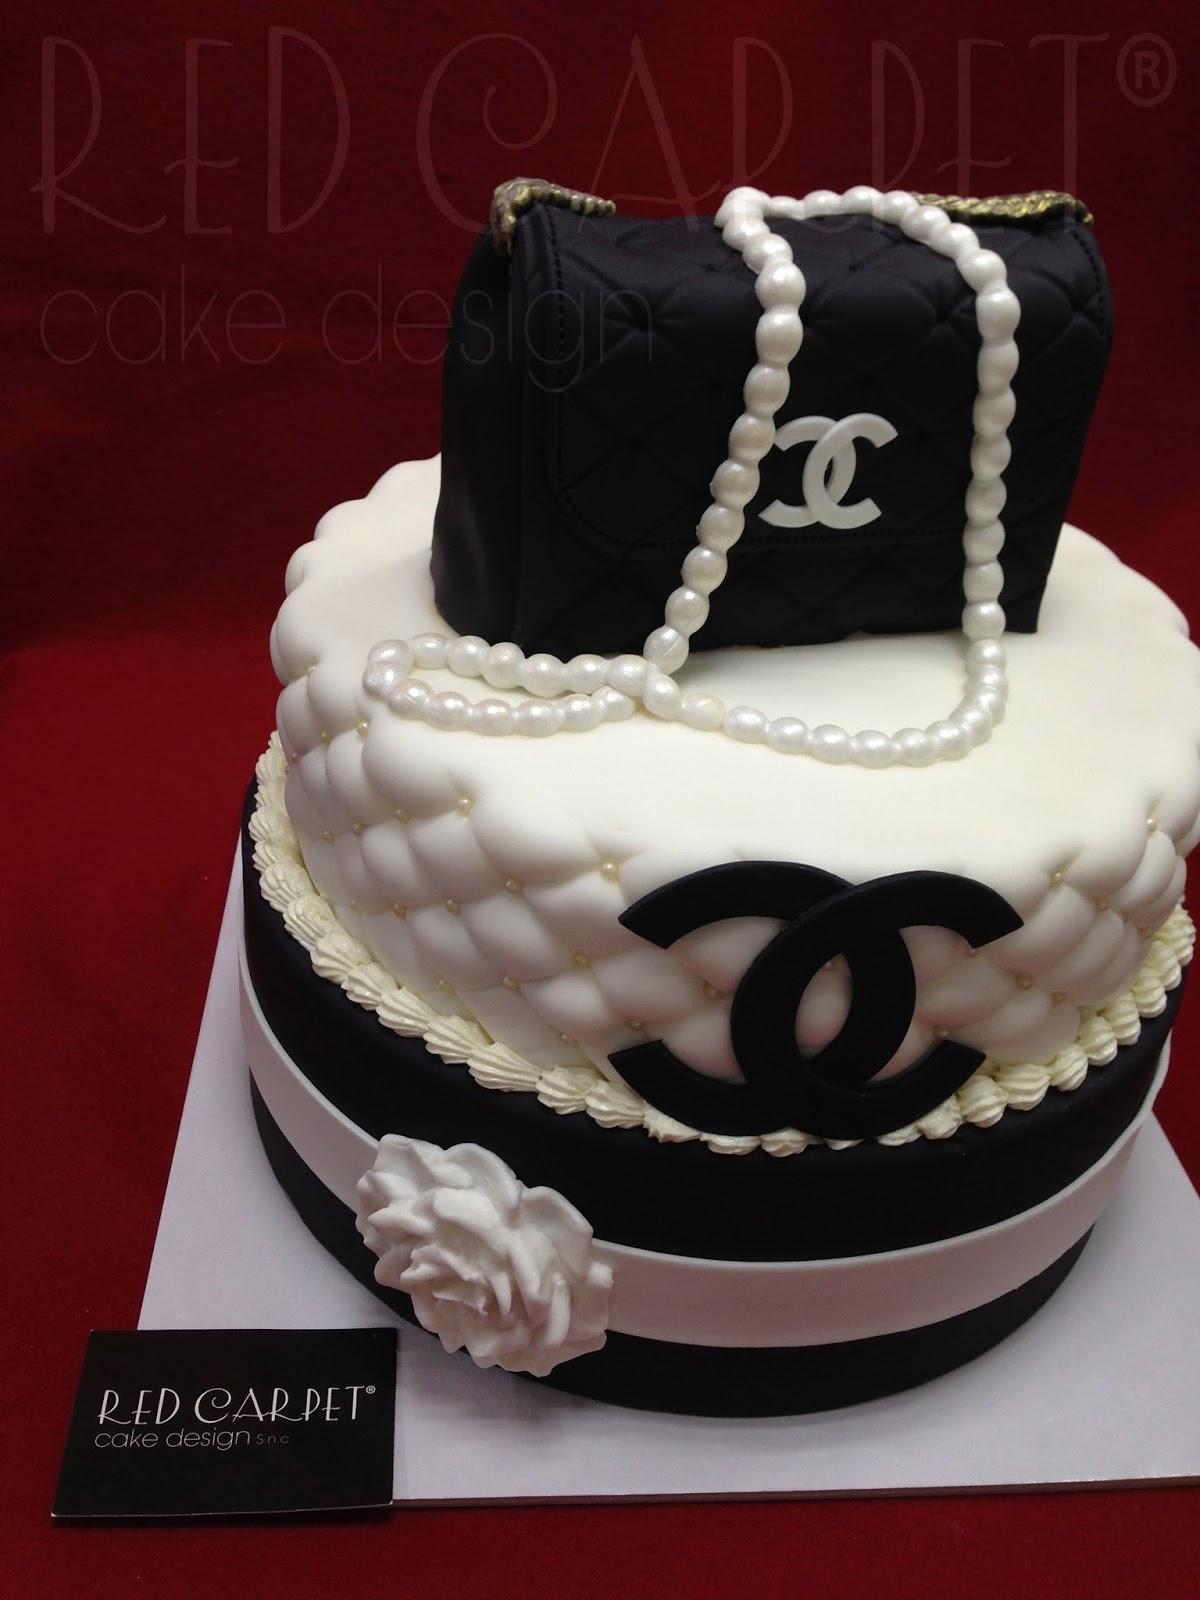 CHANEL BAG CAKE-by #RedCarpetCakeDesign® | Red Carpet Cake Design®